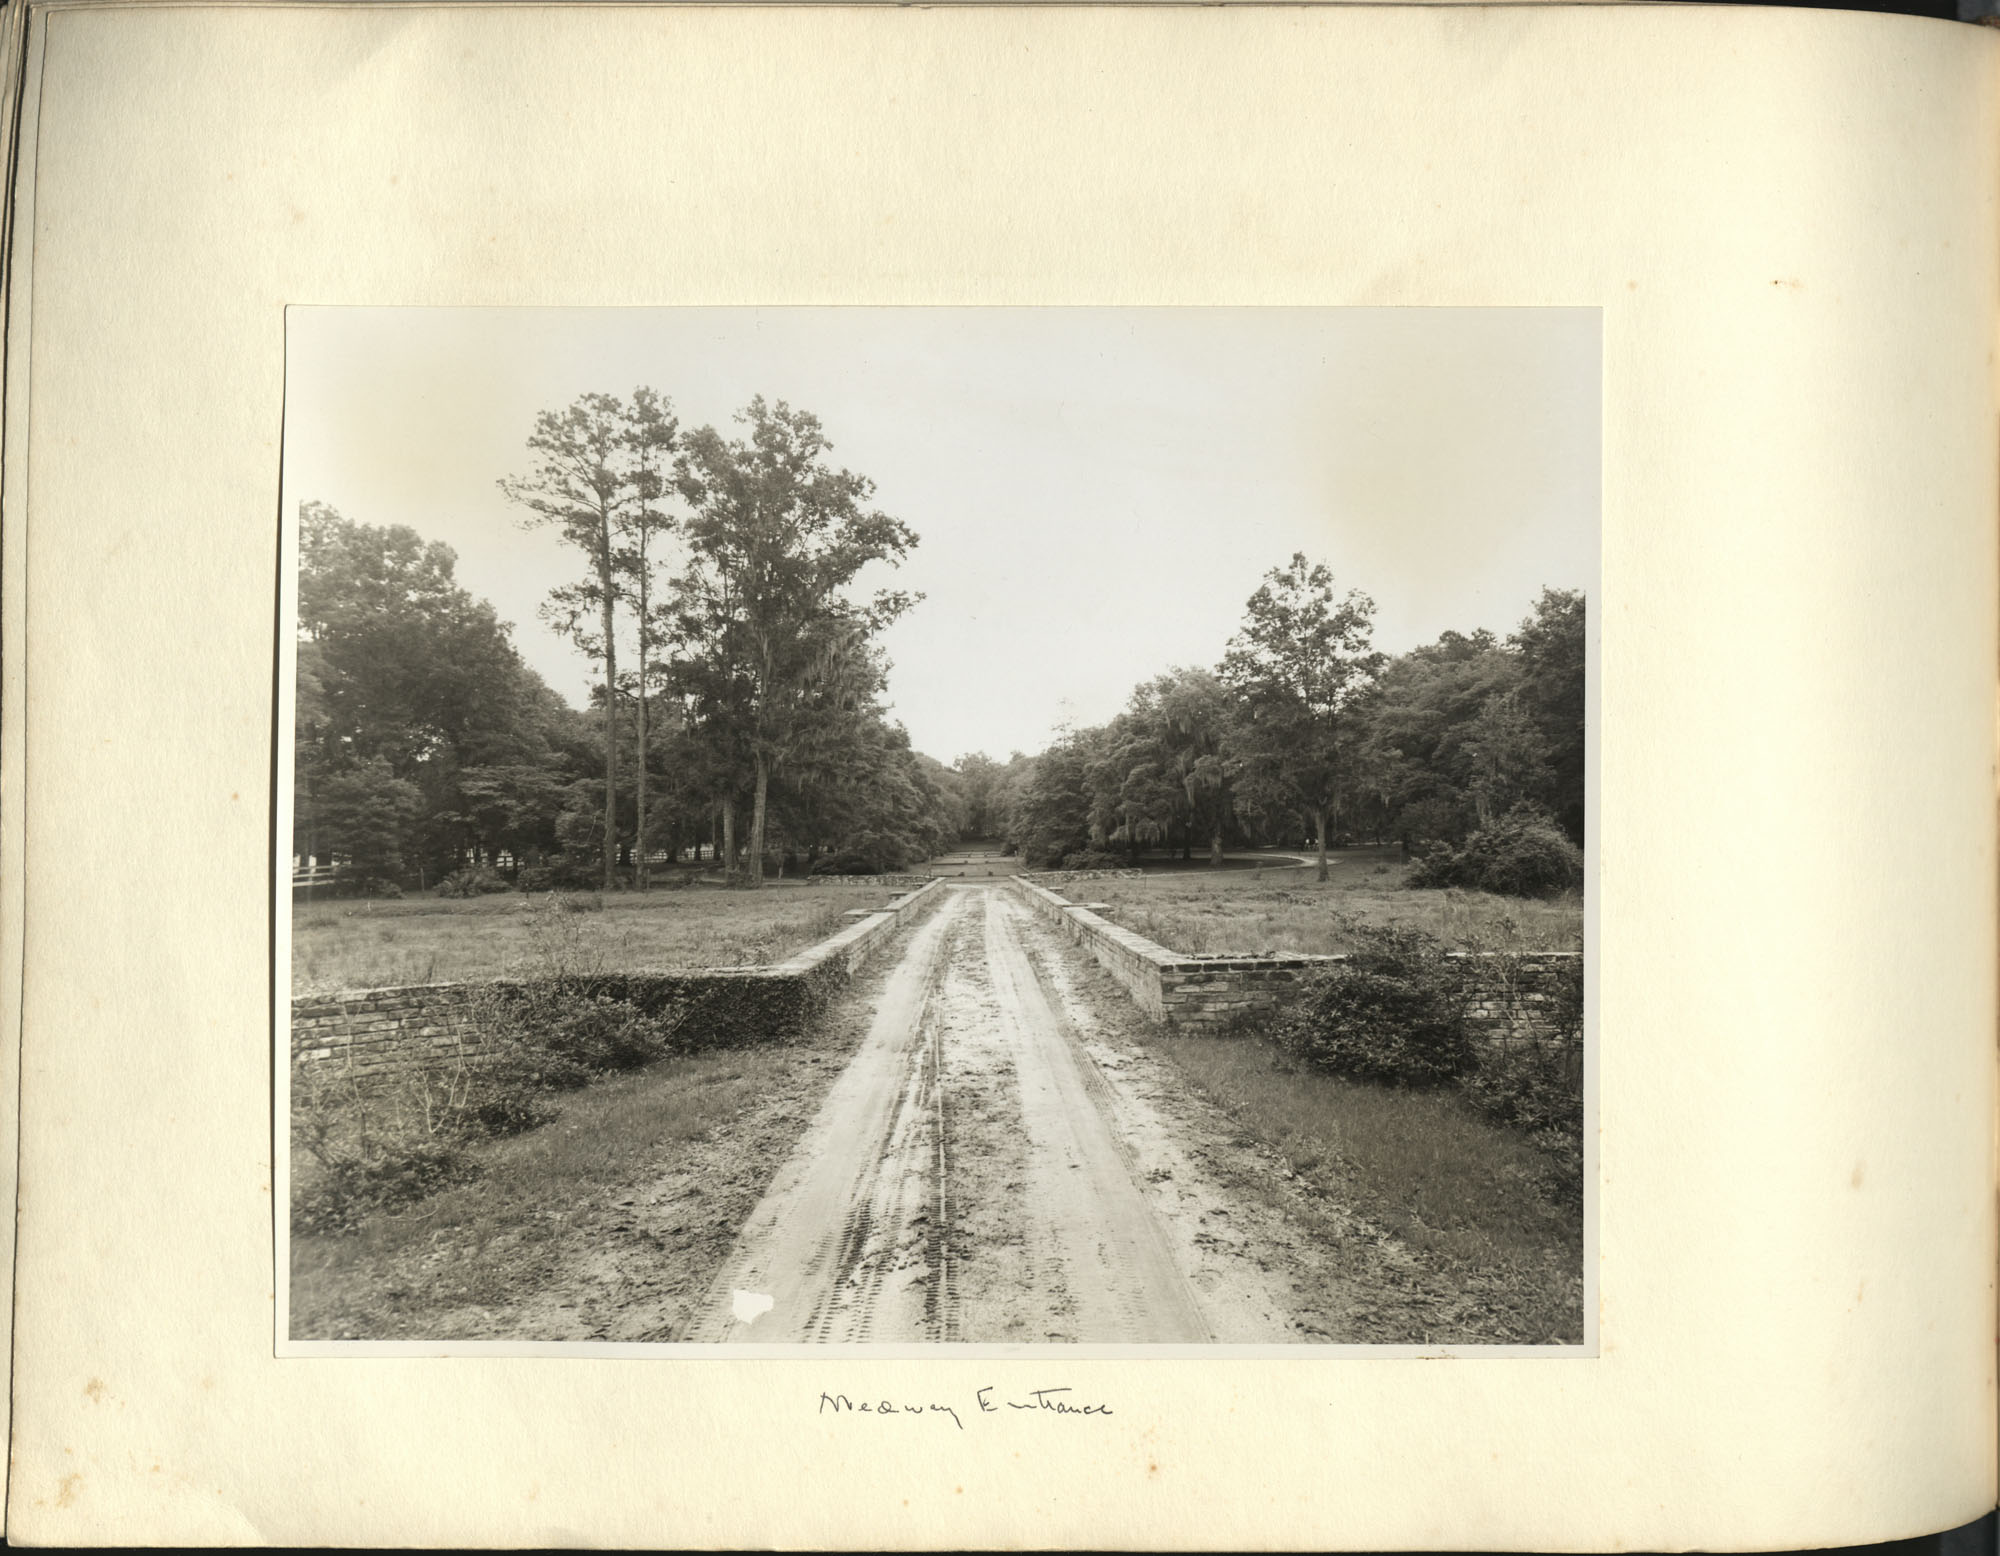 Medway Plantation Photograph Album, 1949, page 142